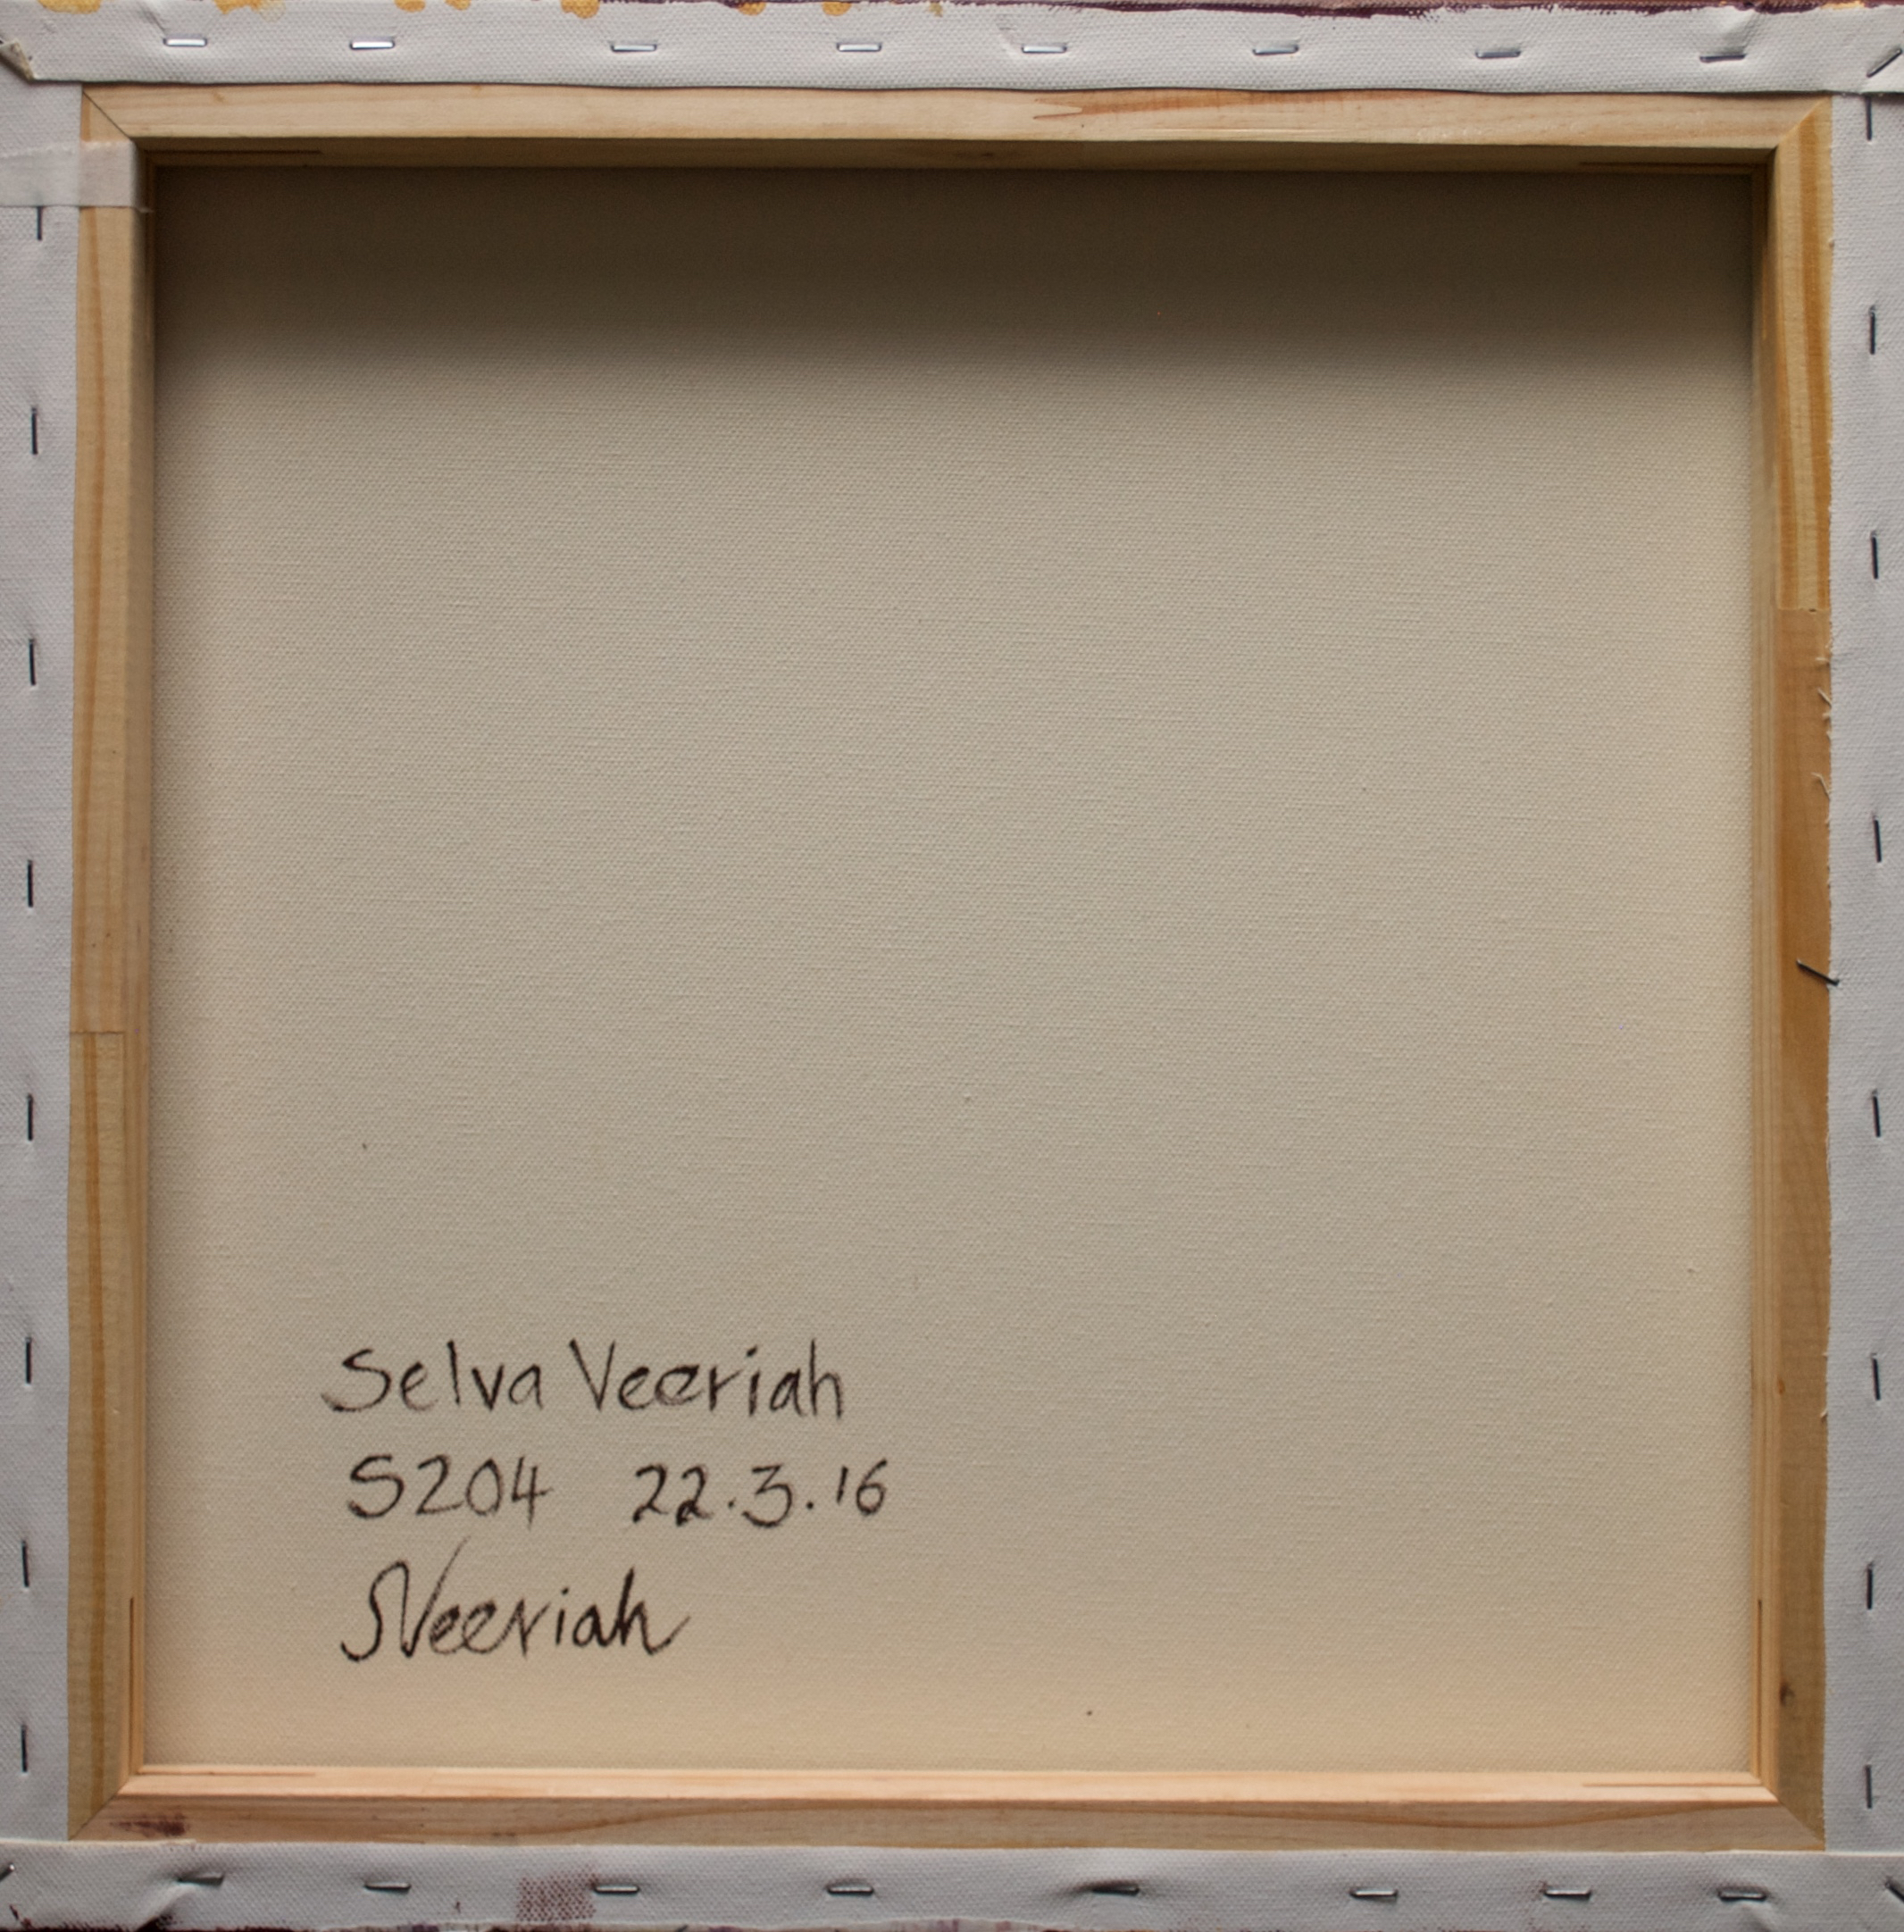 S204 Back of Artwork (Signature)